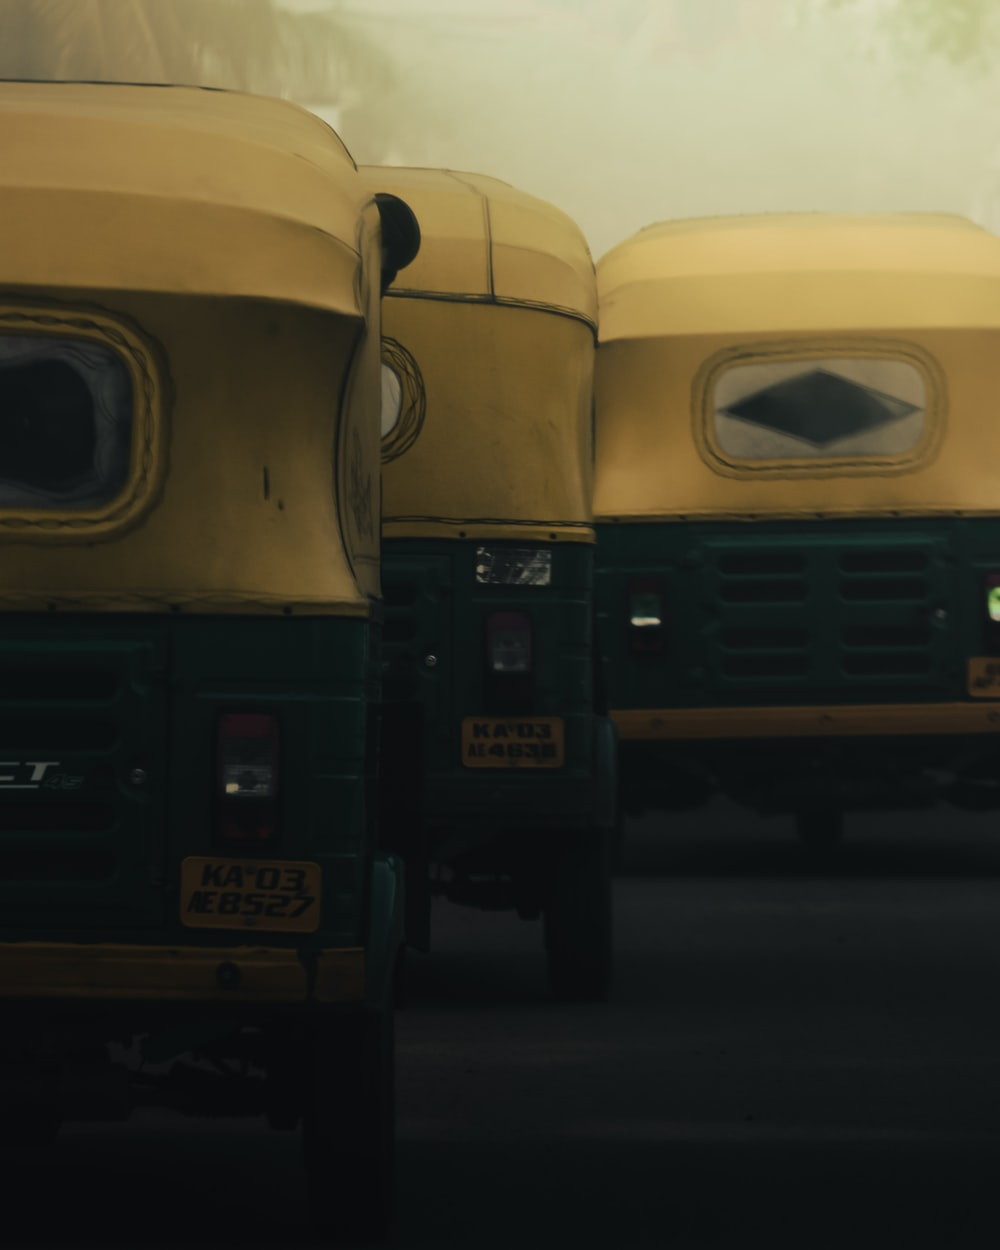 three yellow auto-rickshaws